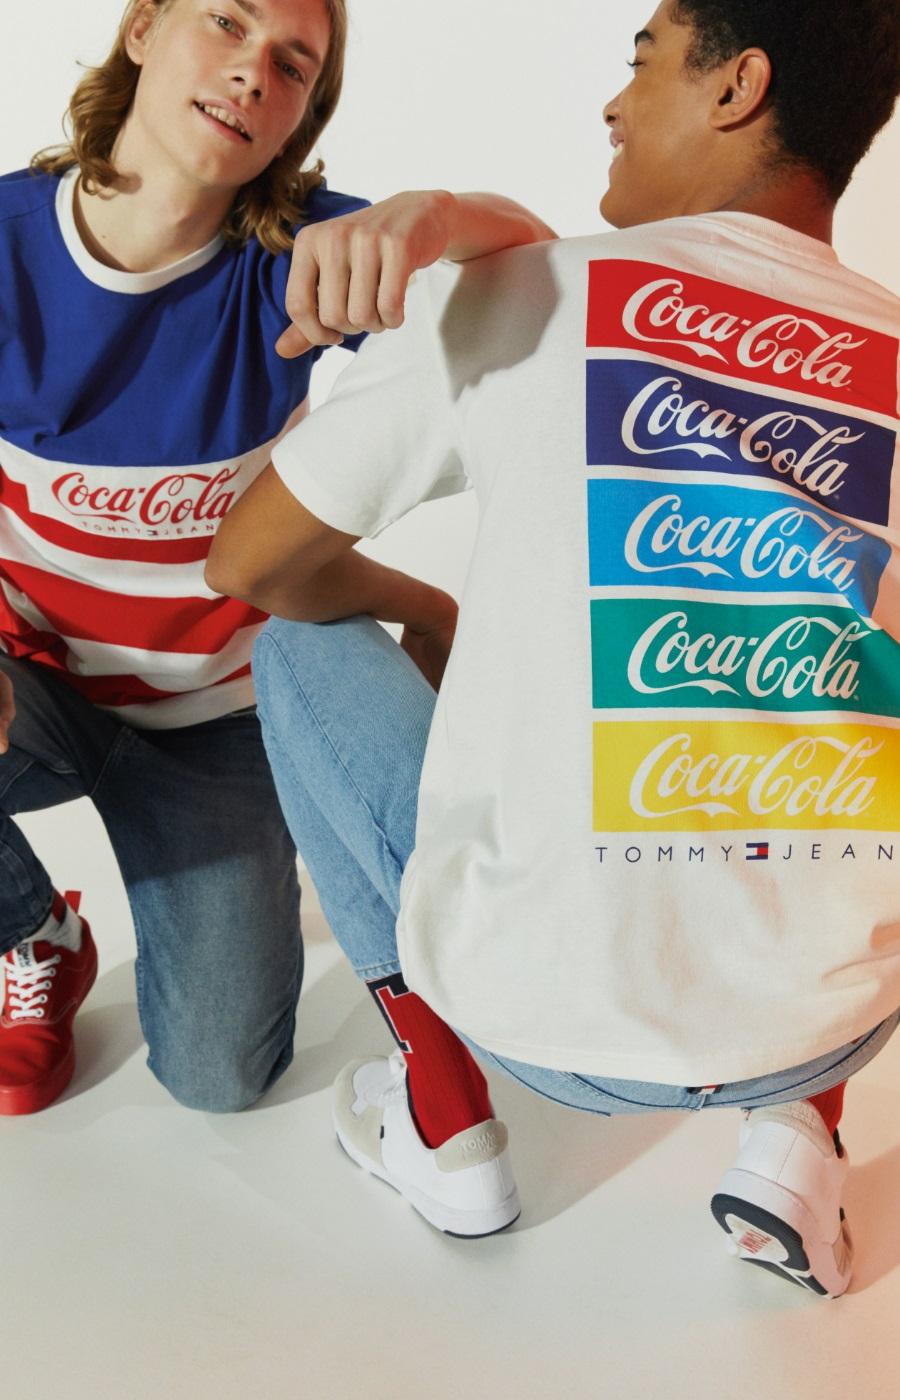 tommy-hilfiger-coca-cola-3